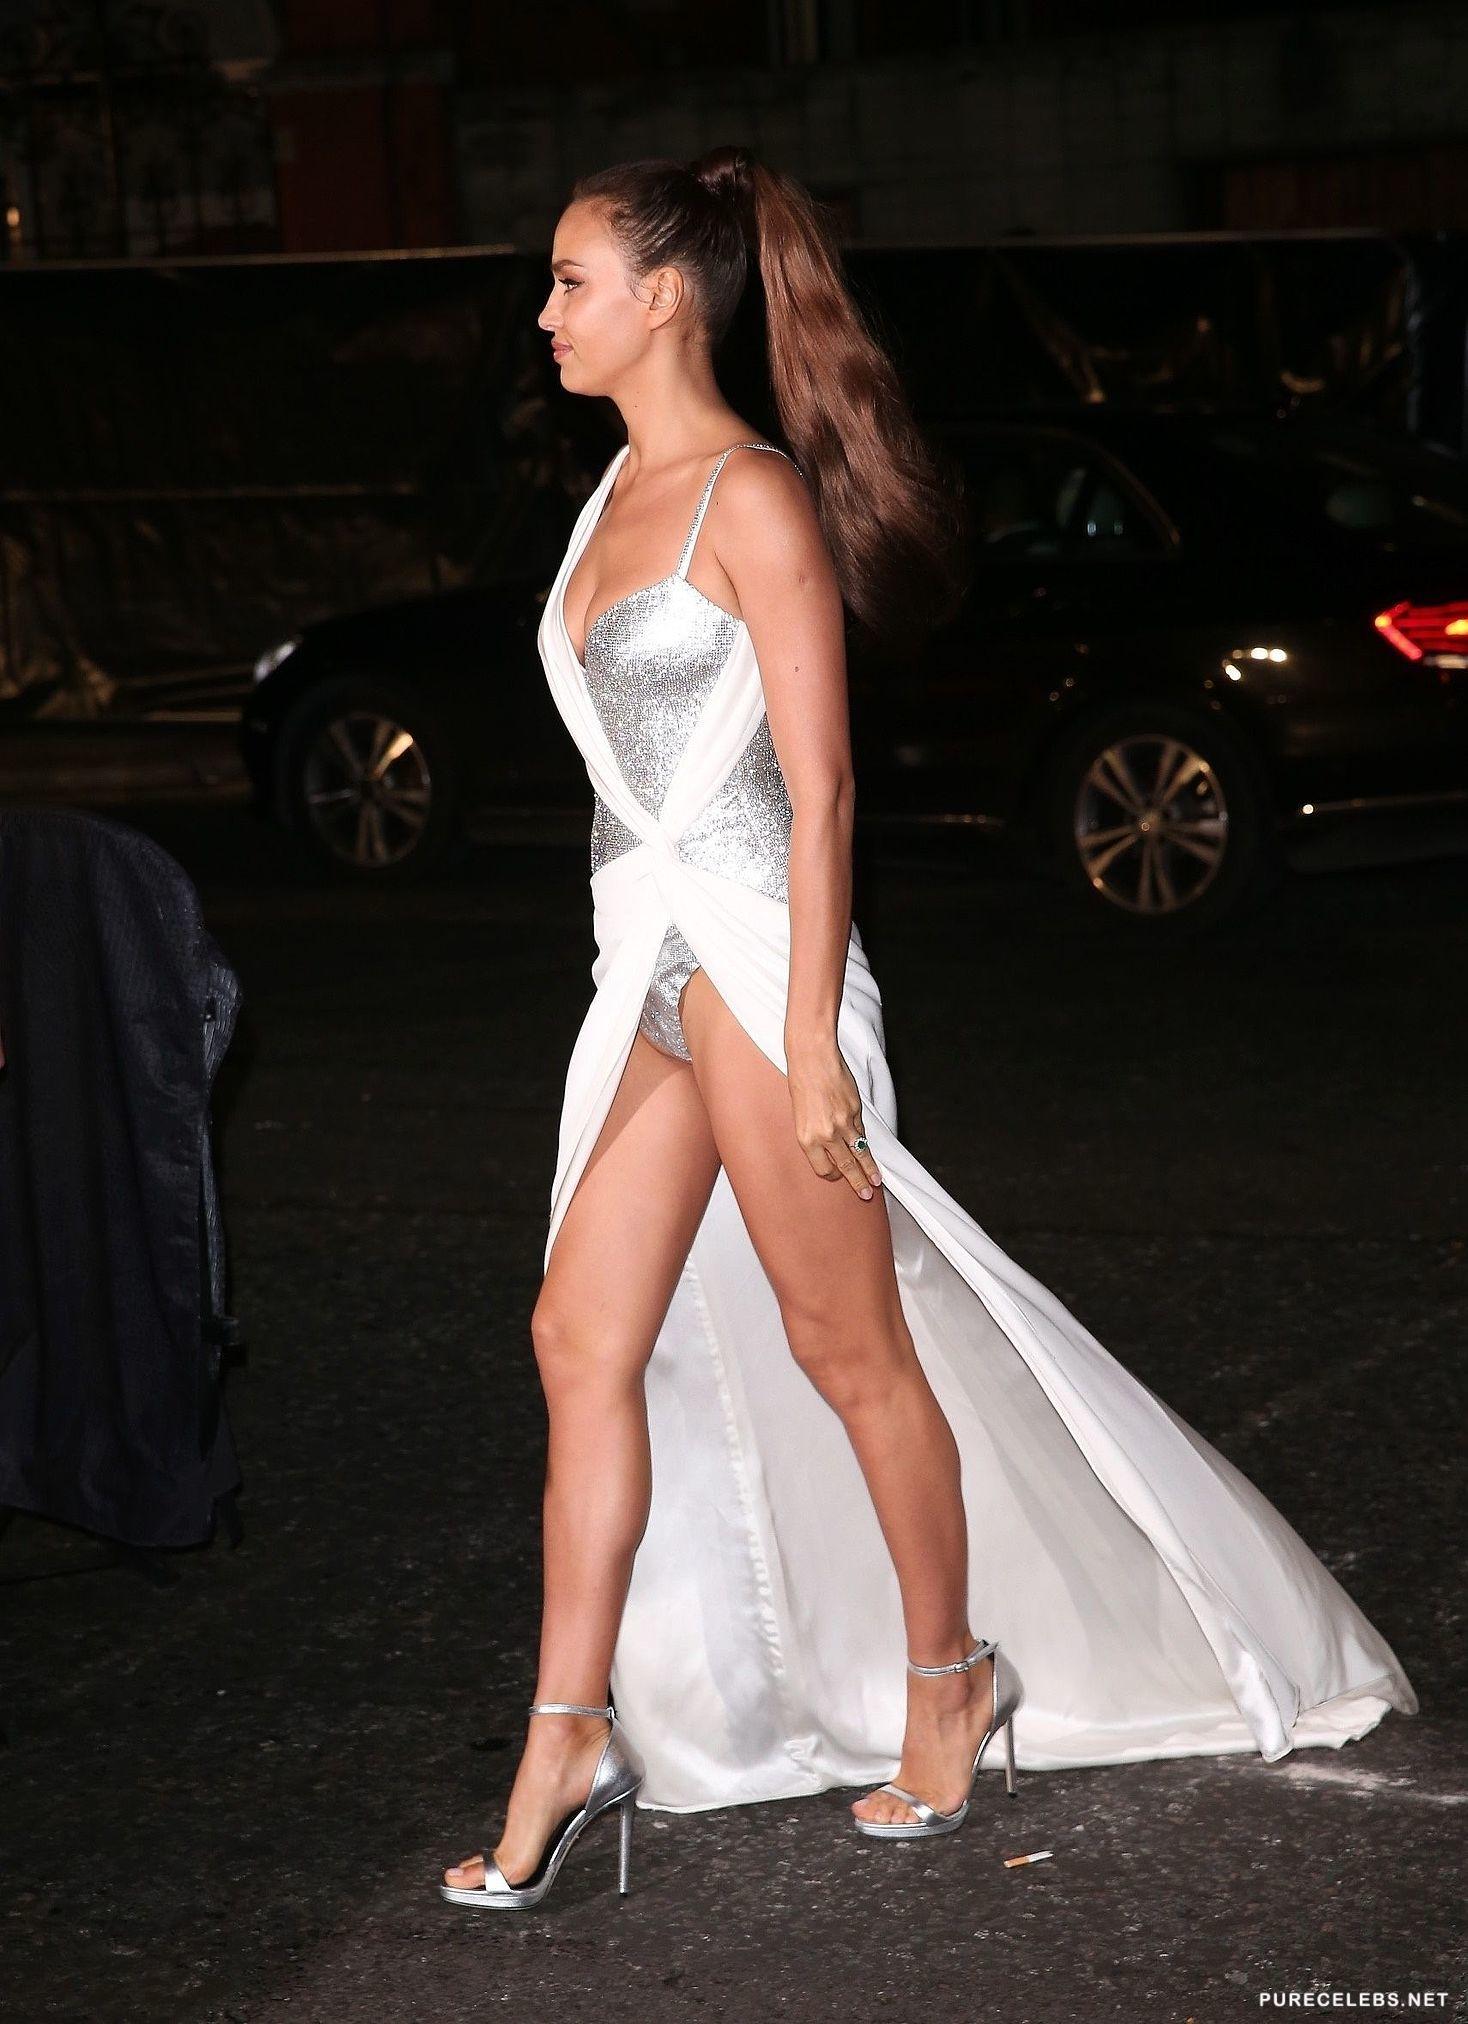 Irina Shayk Nude And Upskirt Photos - NuCelebs.com